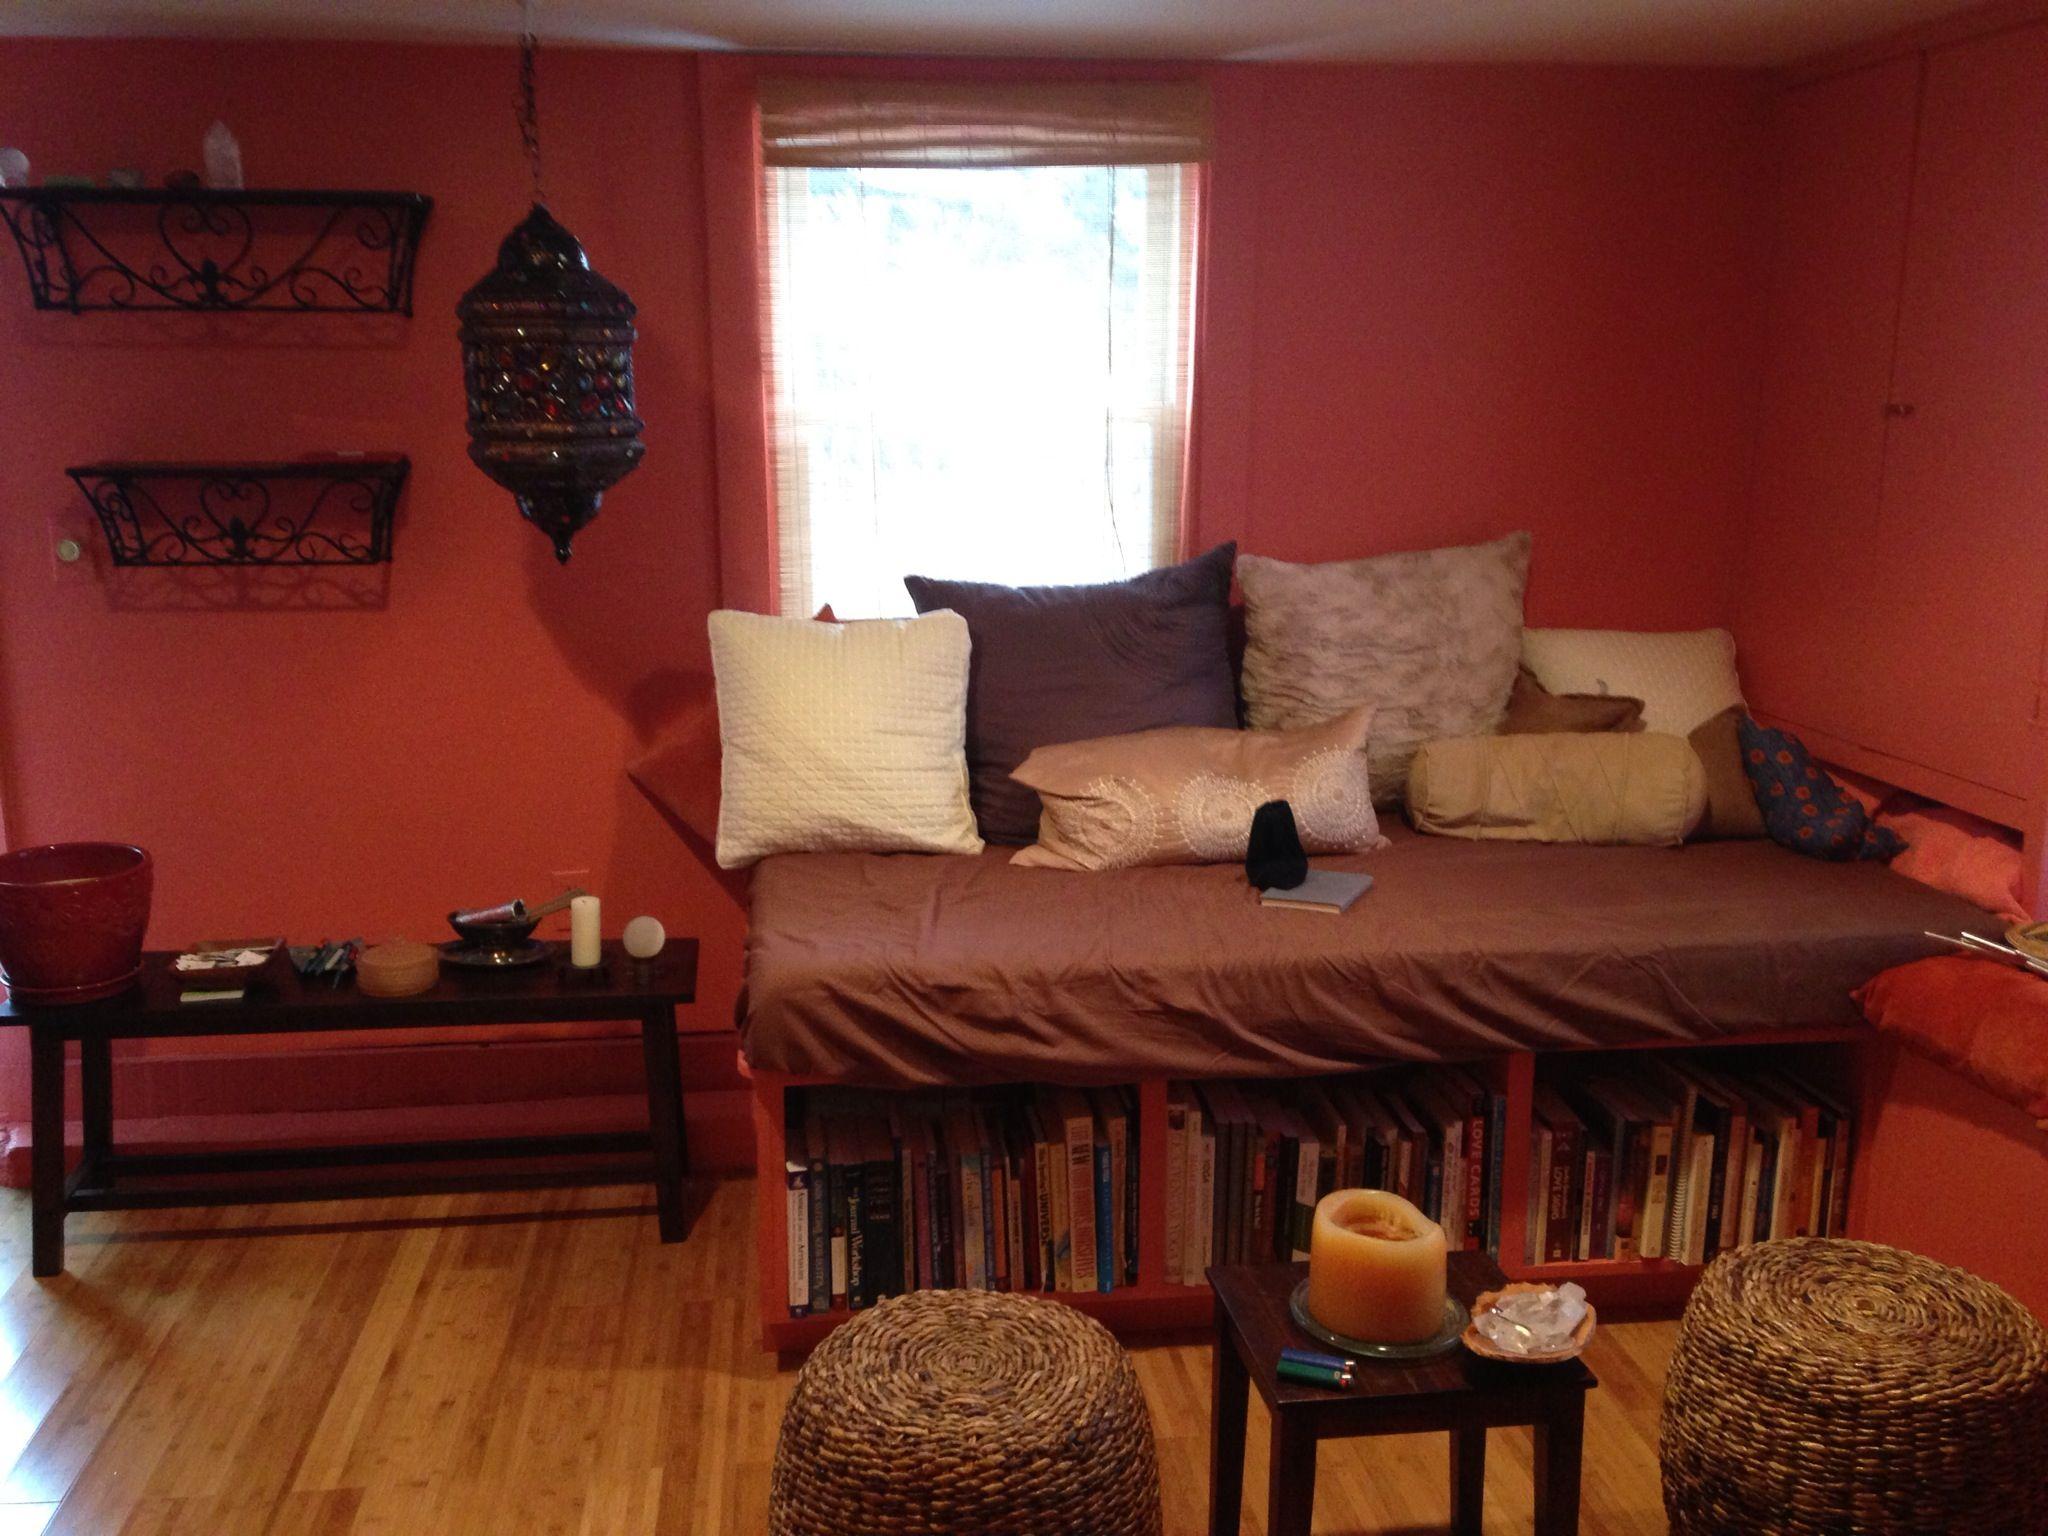 Meditation room for the home pinterest for Small meditation room